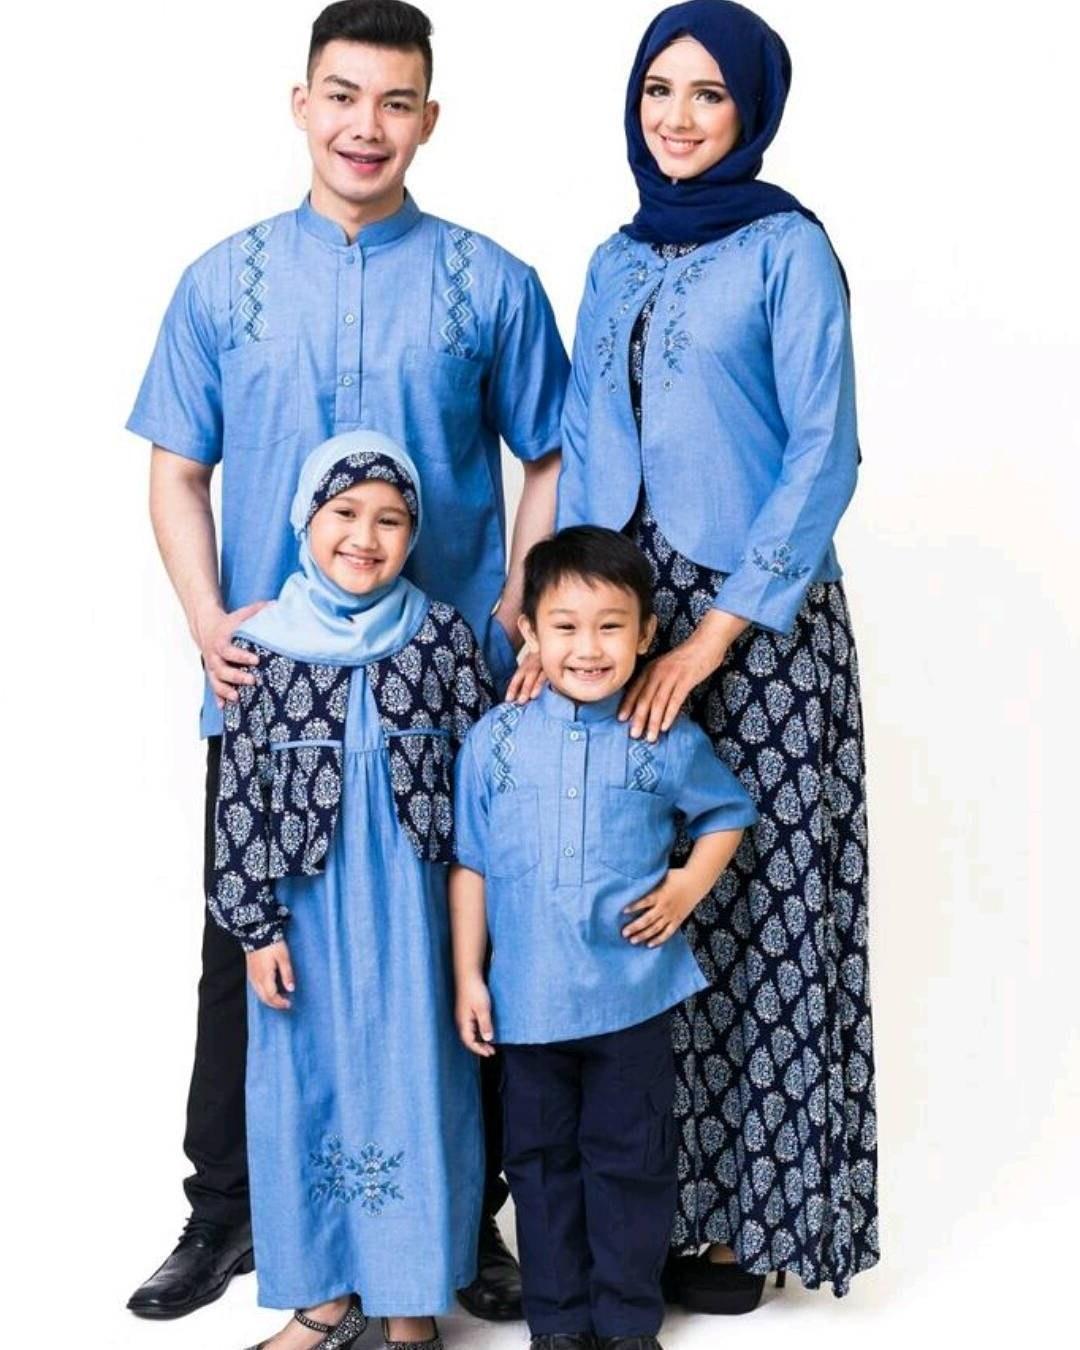 Ide Model Baju Lebaran 2018 Untuk orang Gemuk Irdz Model Baju Keluarga Untuk Hari Raya Lebaran 2018